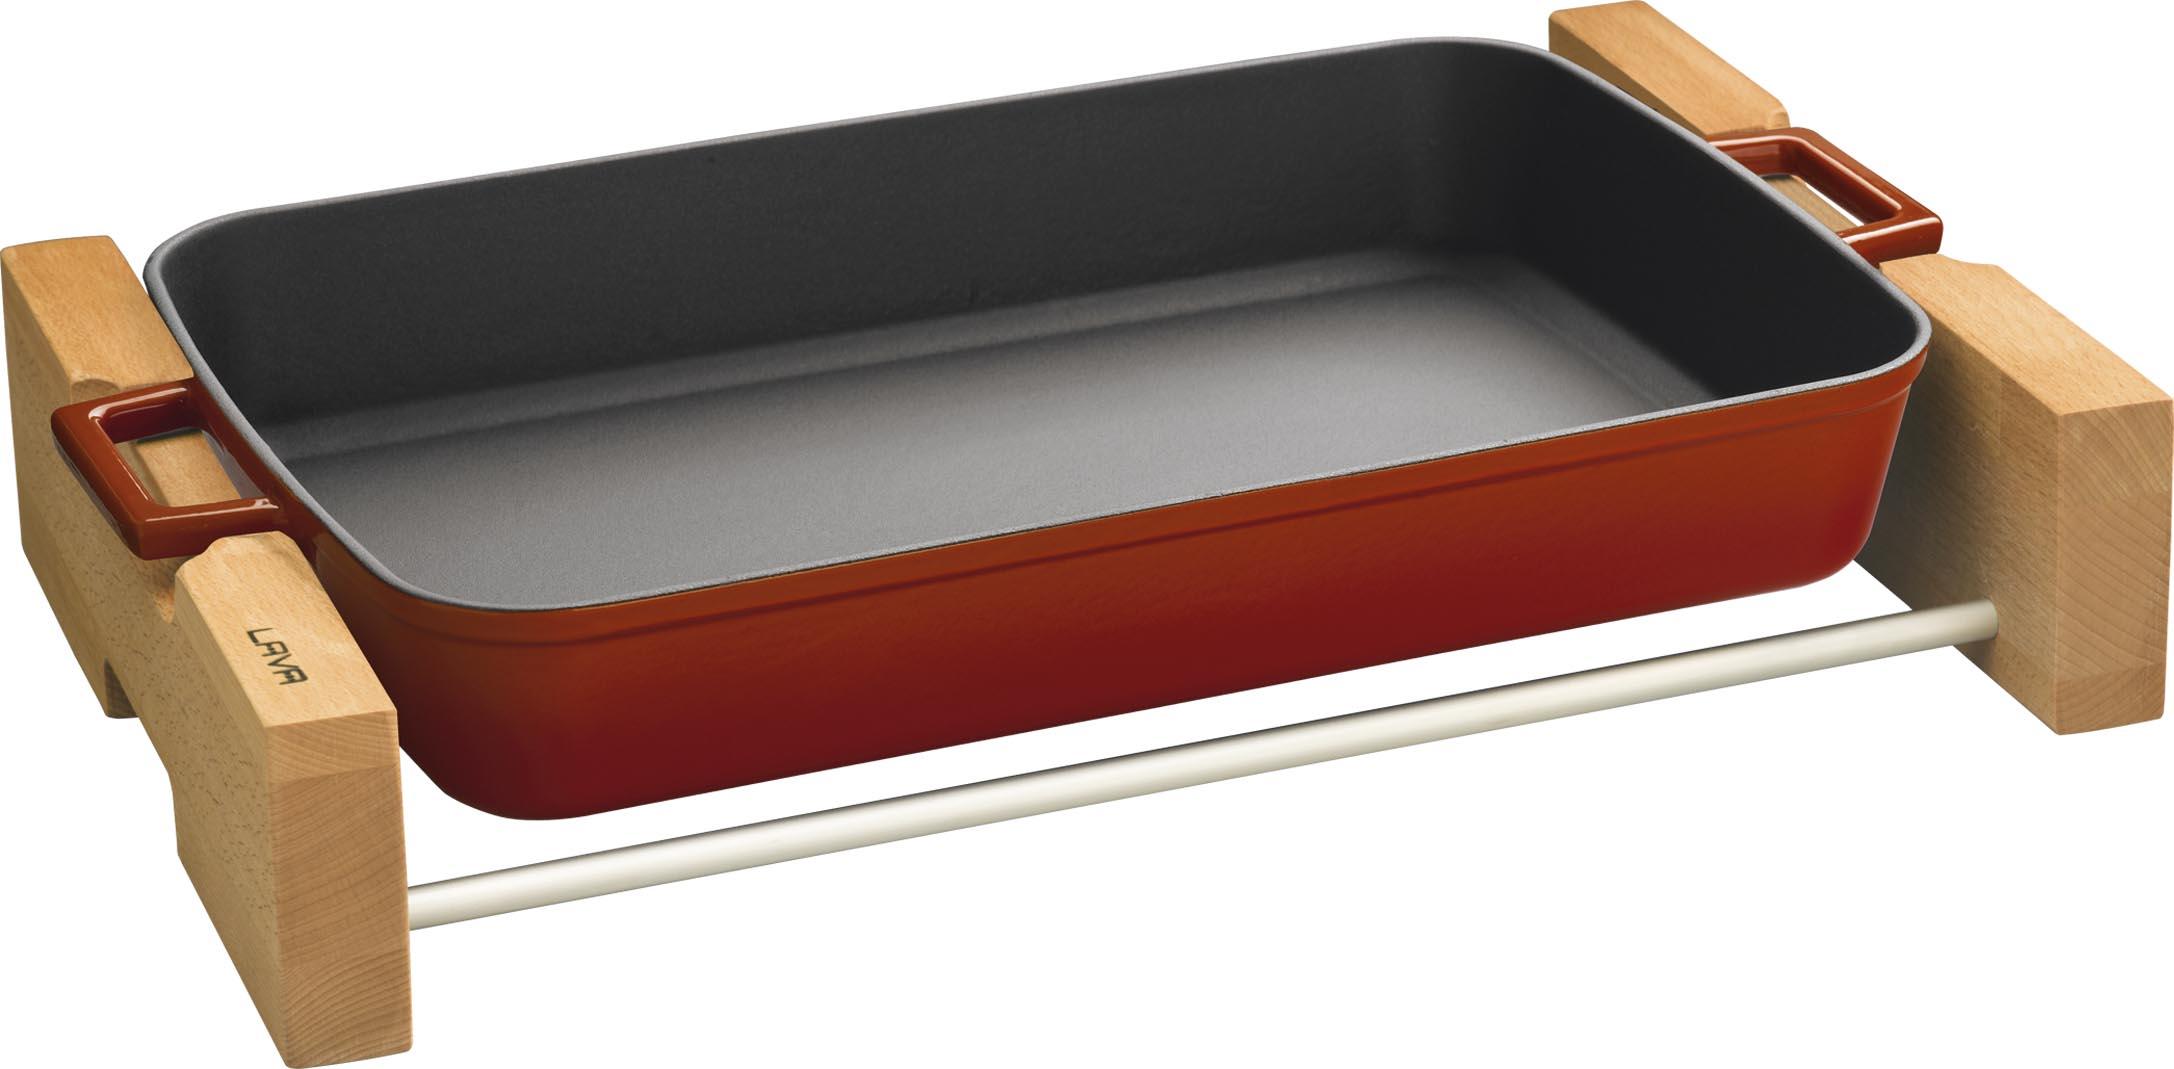 LAVA Metal Pekáč litinový se servírovacím podstavcem 26 x 40 cm červený LAVA Metal